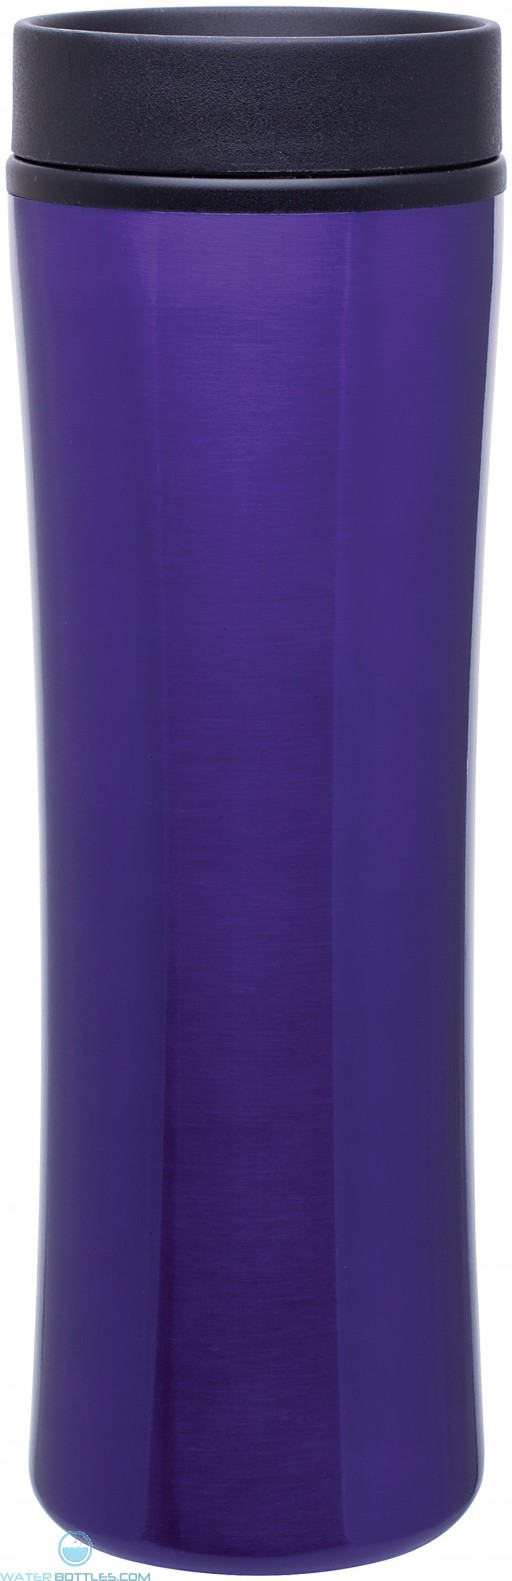 Foam Insulated Cyrus Tumblers | 16 oz - Purple